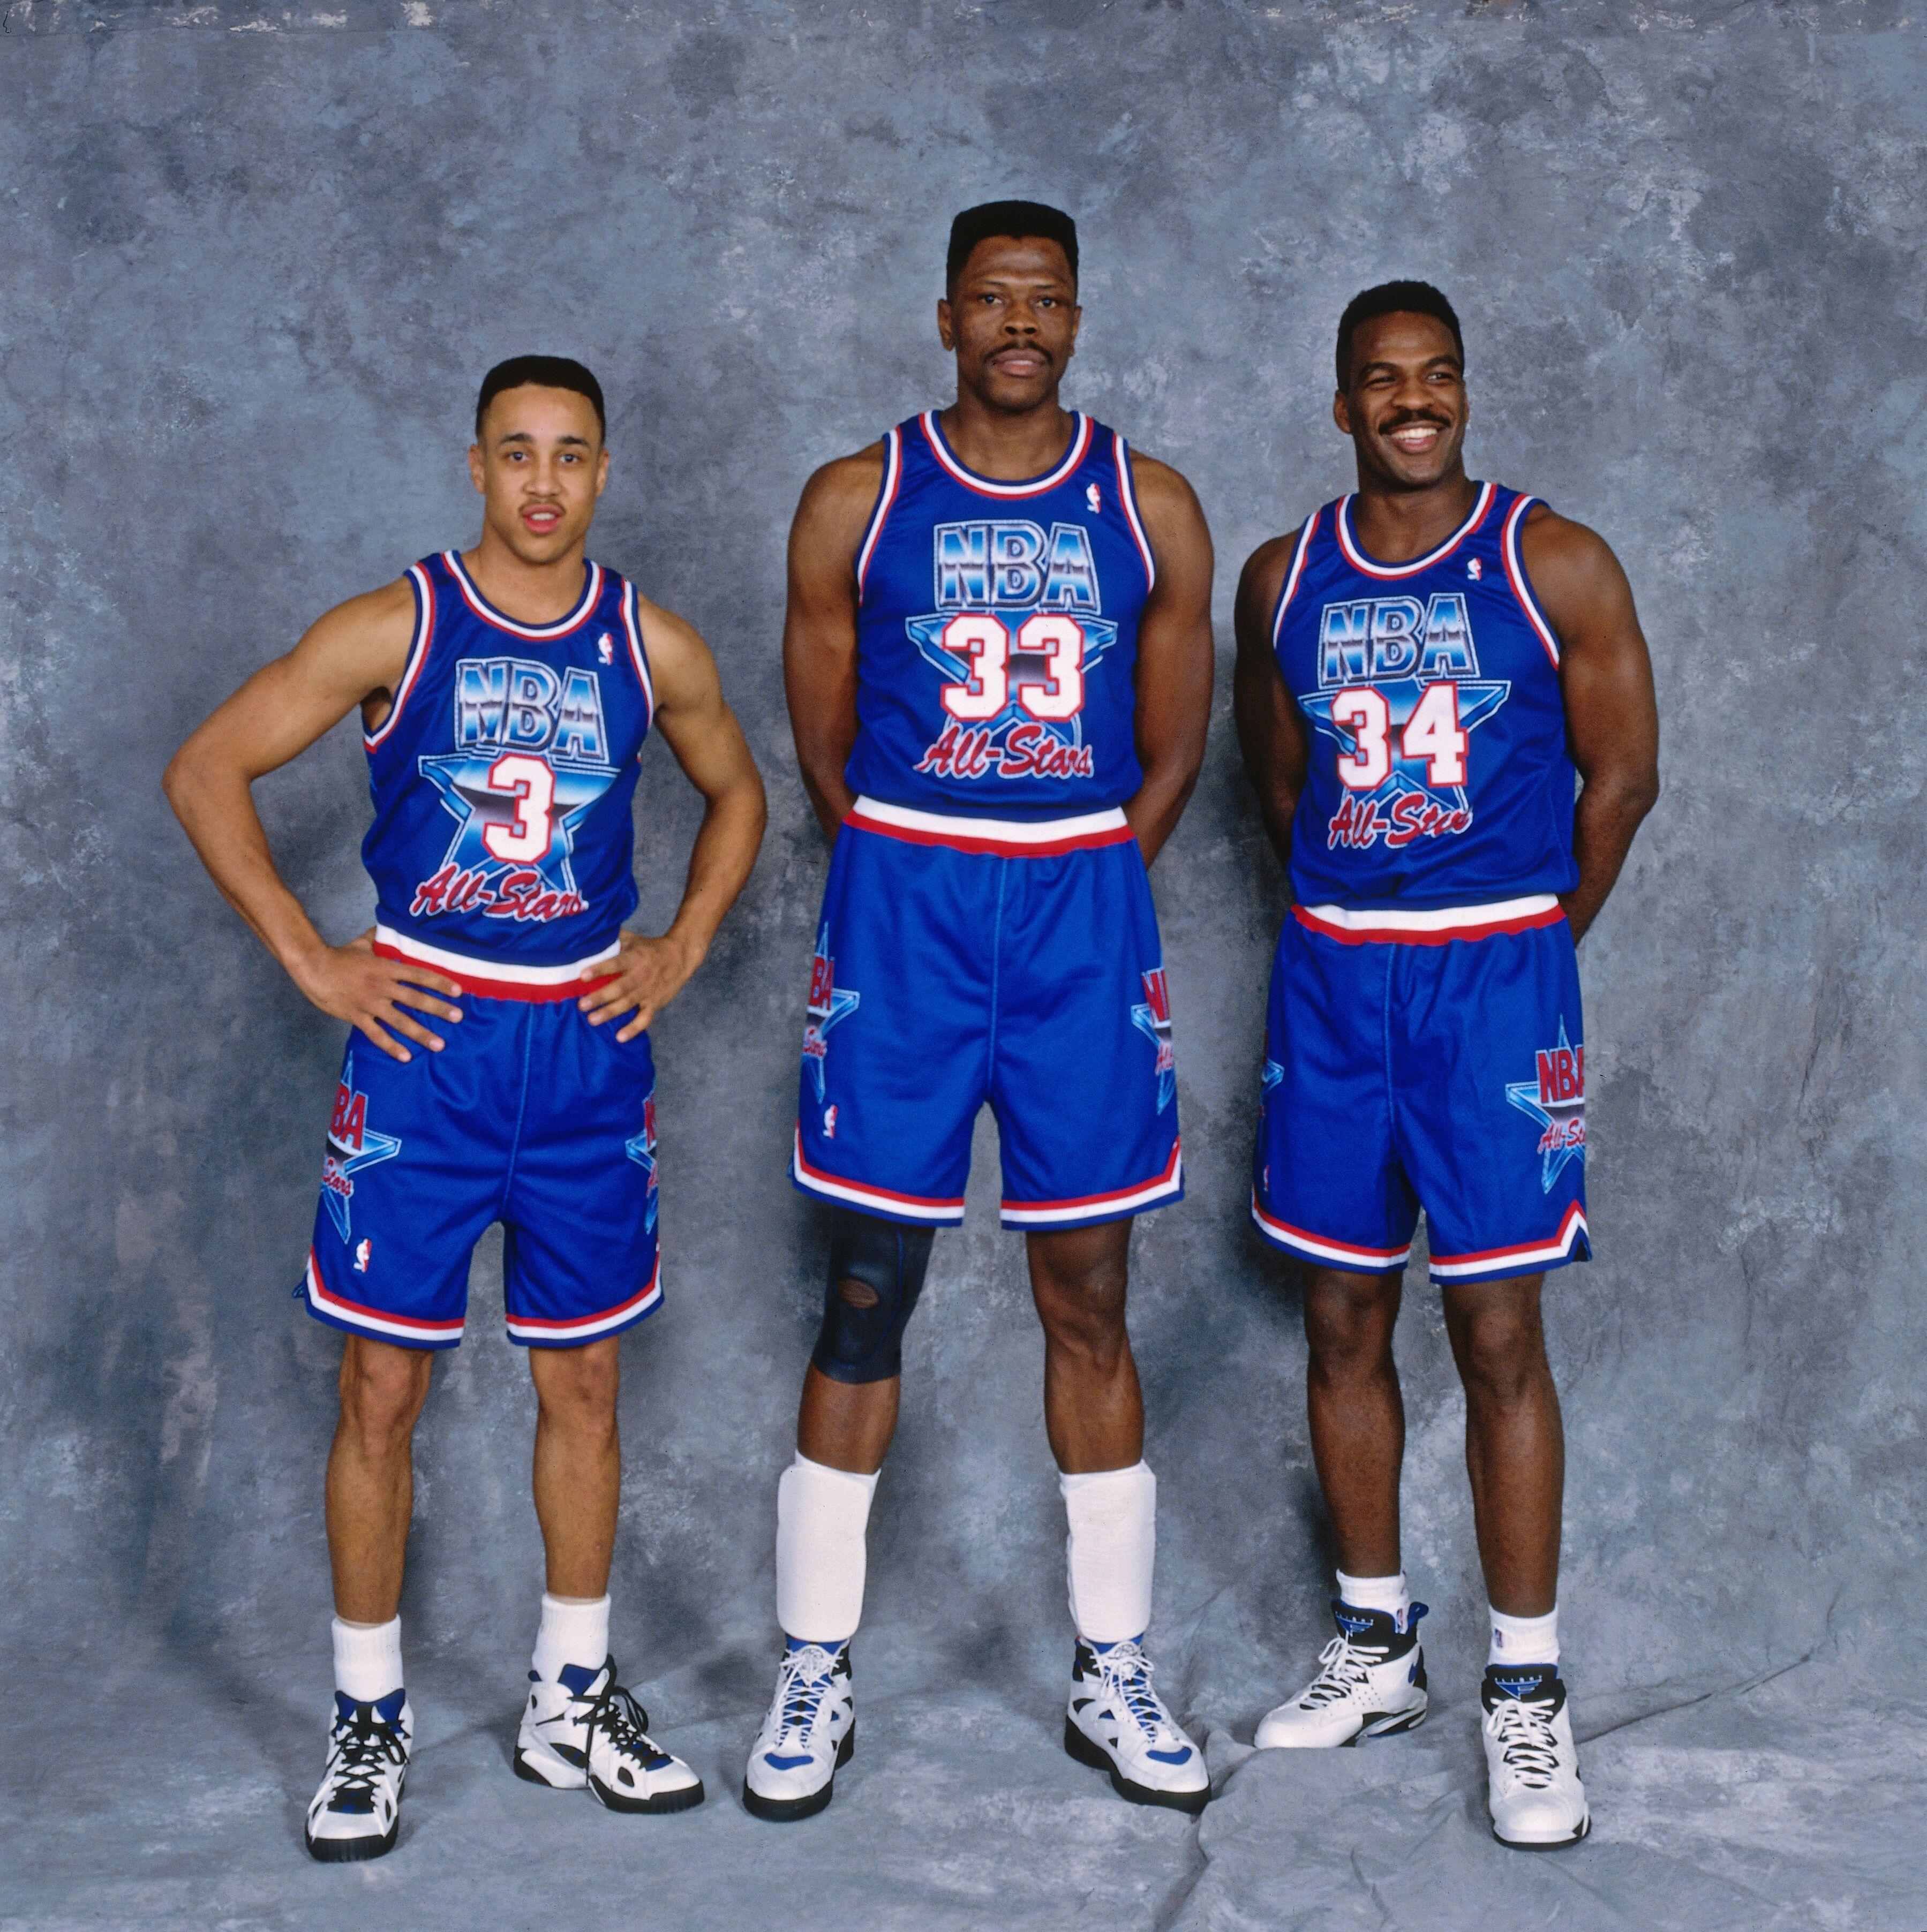 New York Knicks: NBA 2K18 reveals NYK's all-time roster